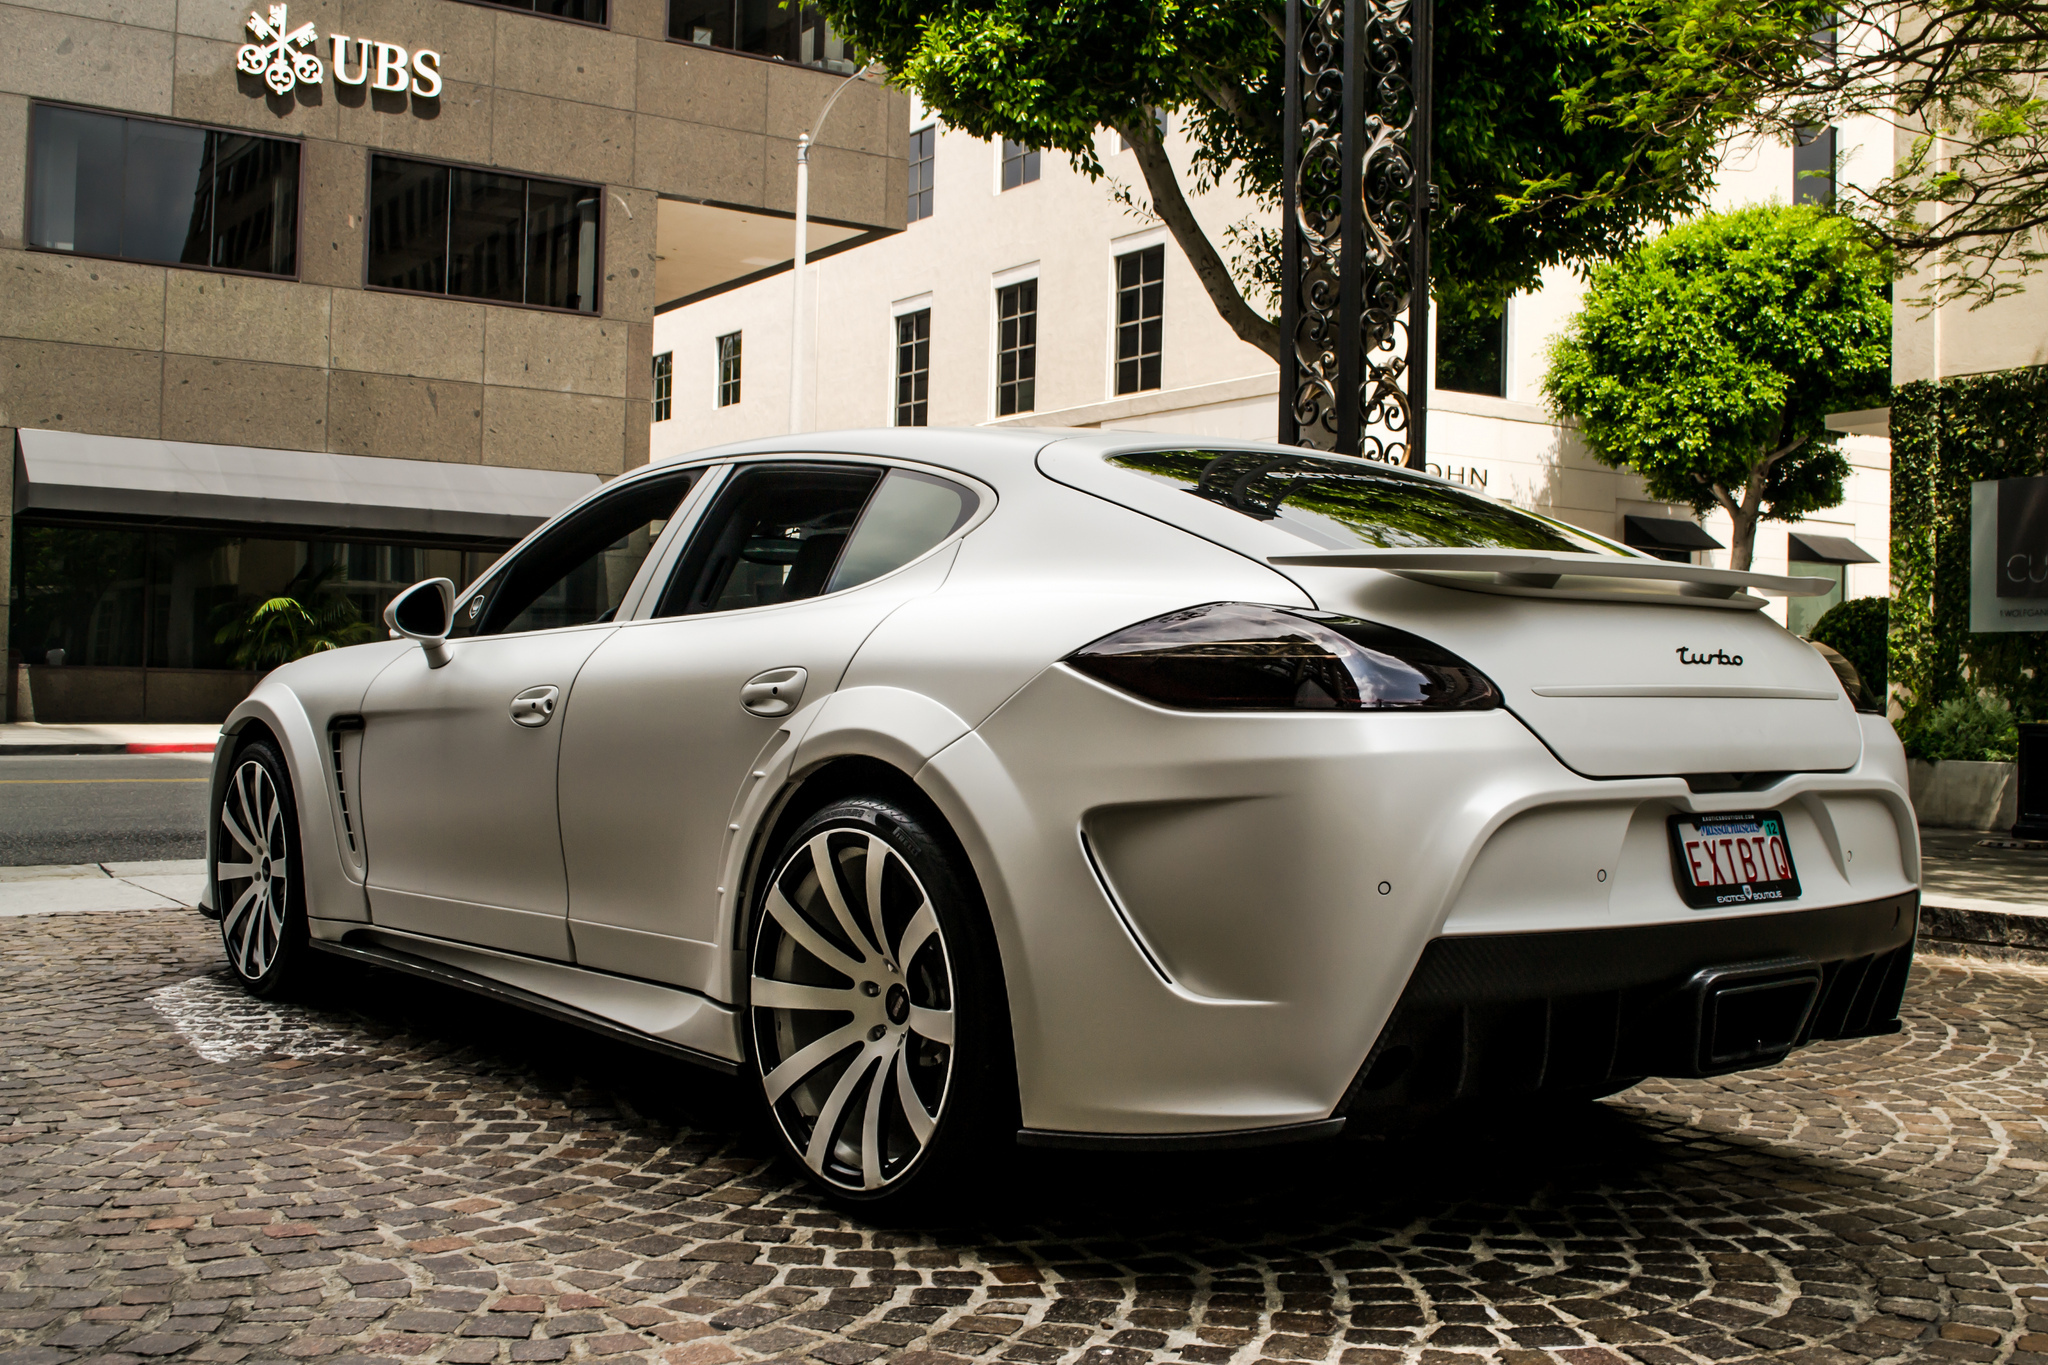 Porsche Panamera HD Wallpaper